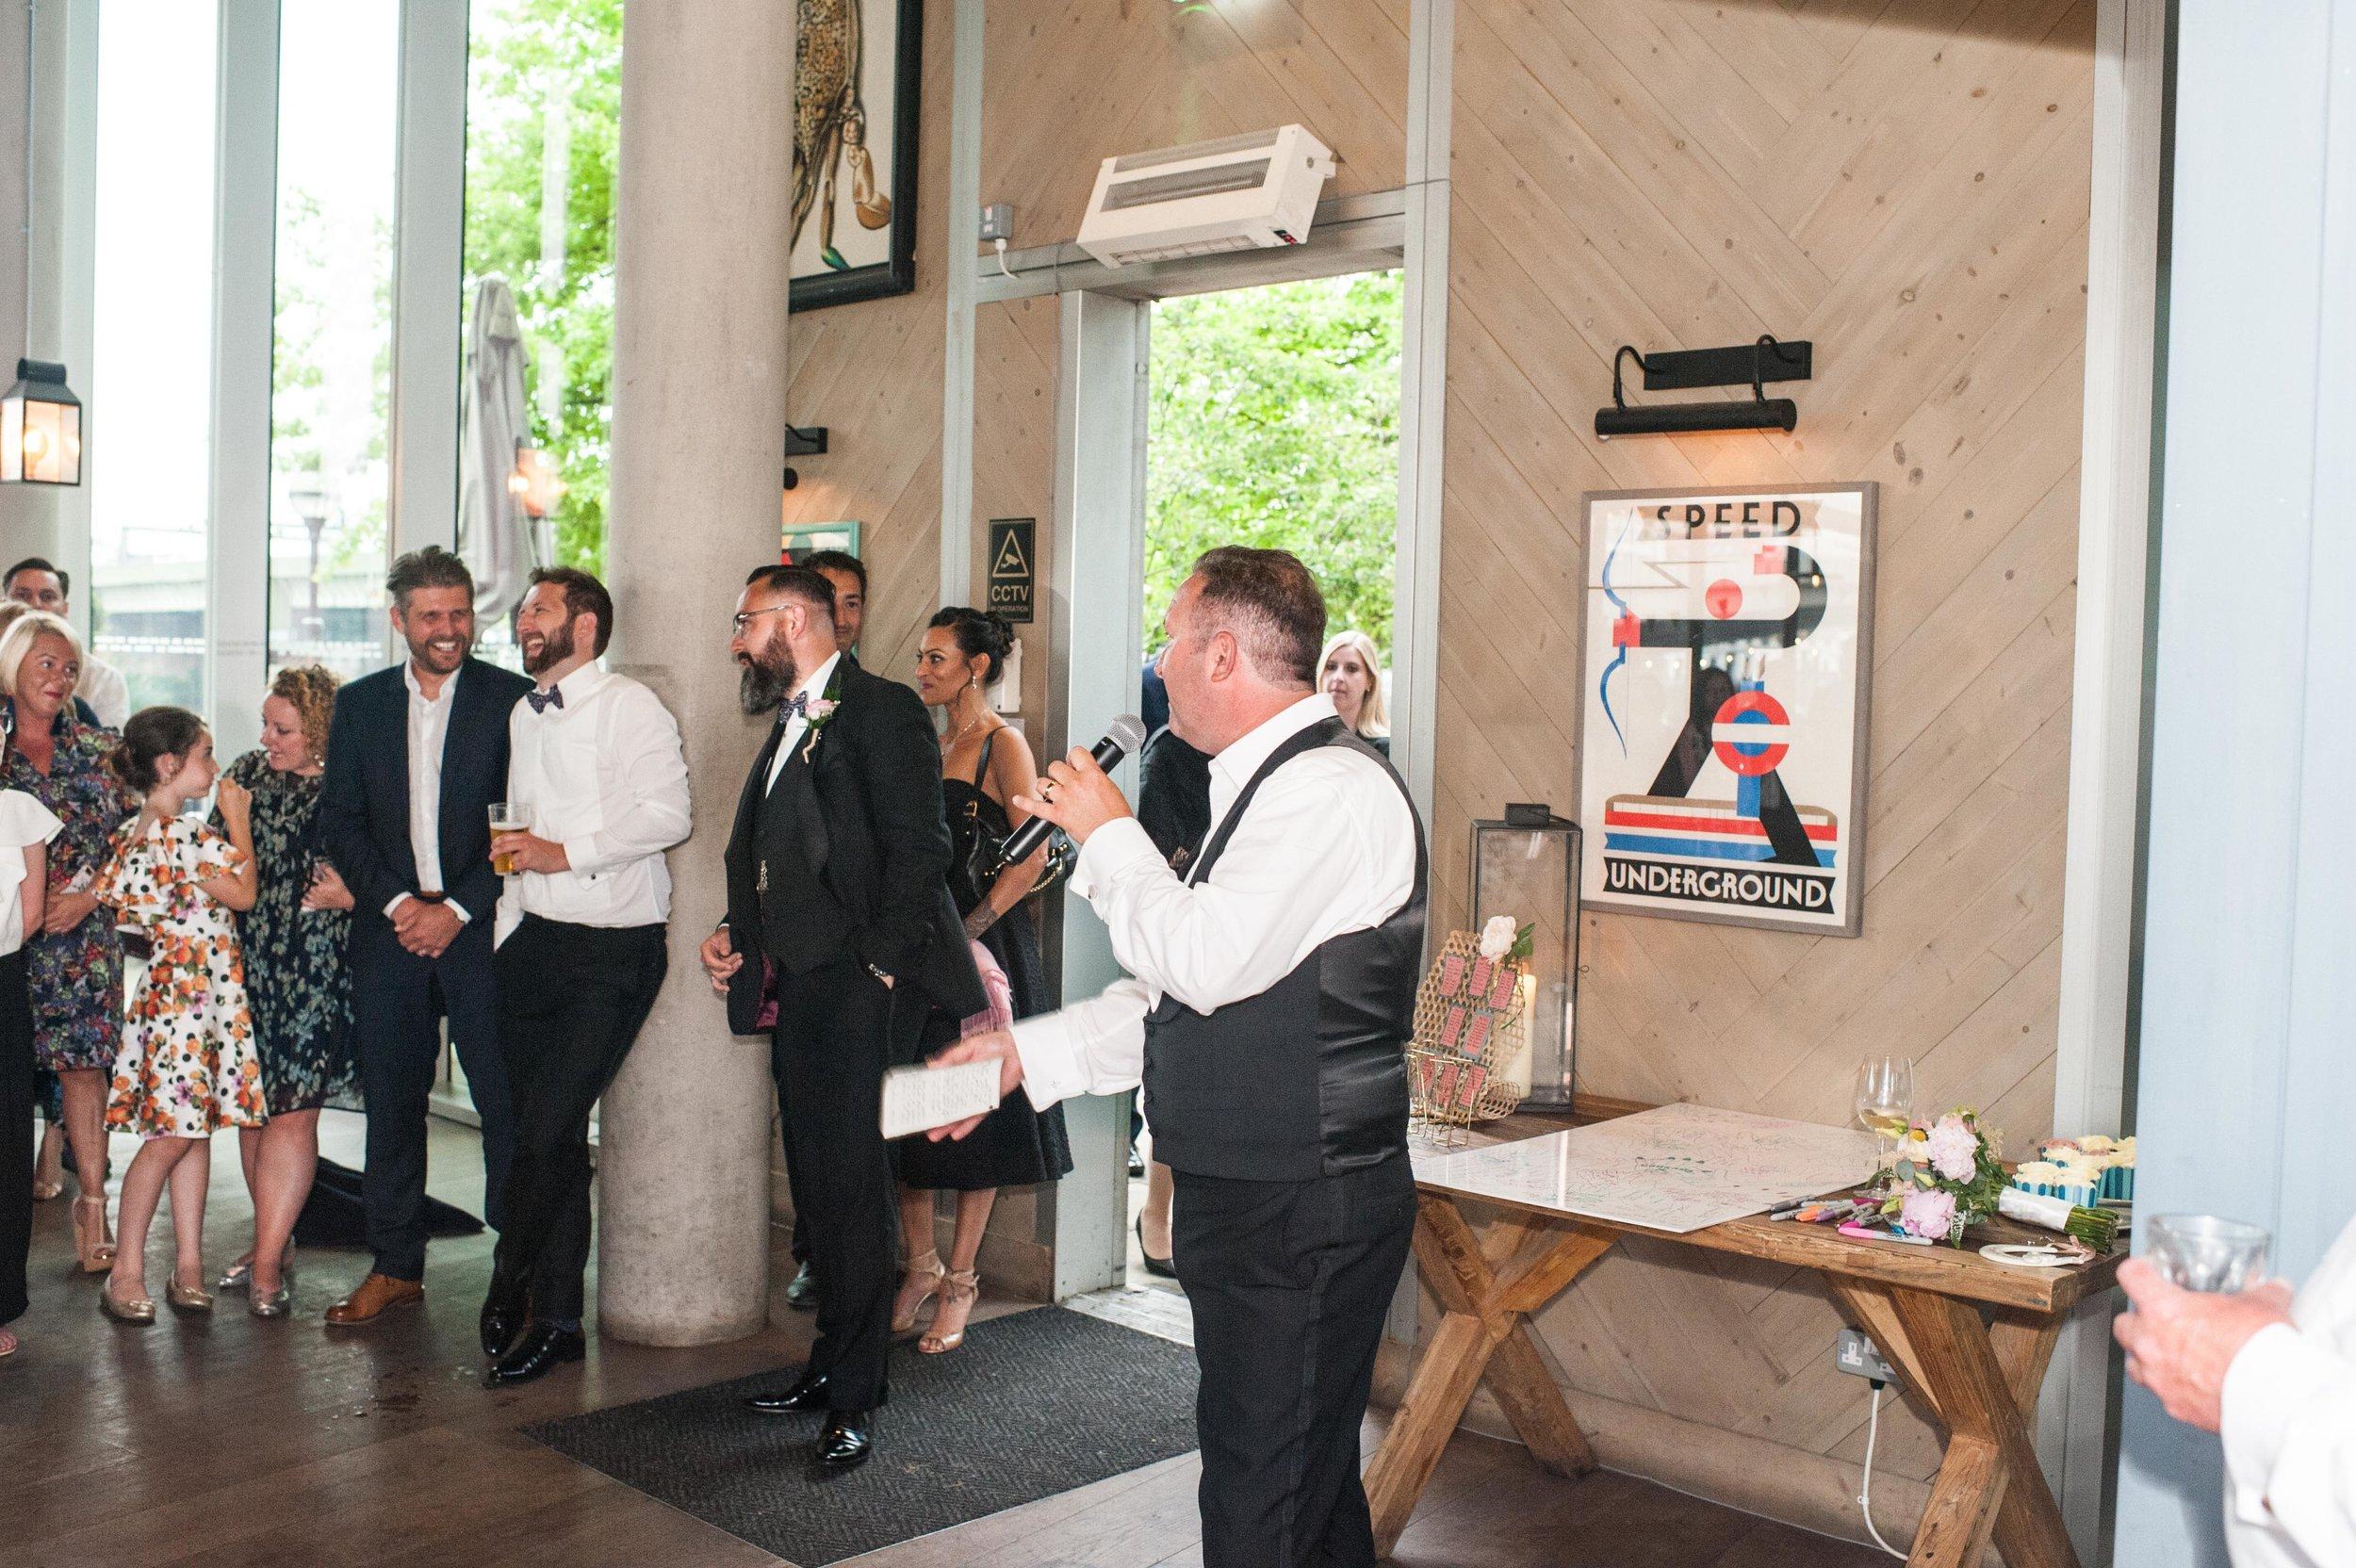 D&M_Marylebone Town Hall Wedding (225 of 239).jpg